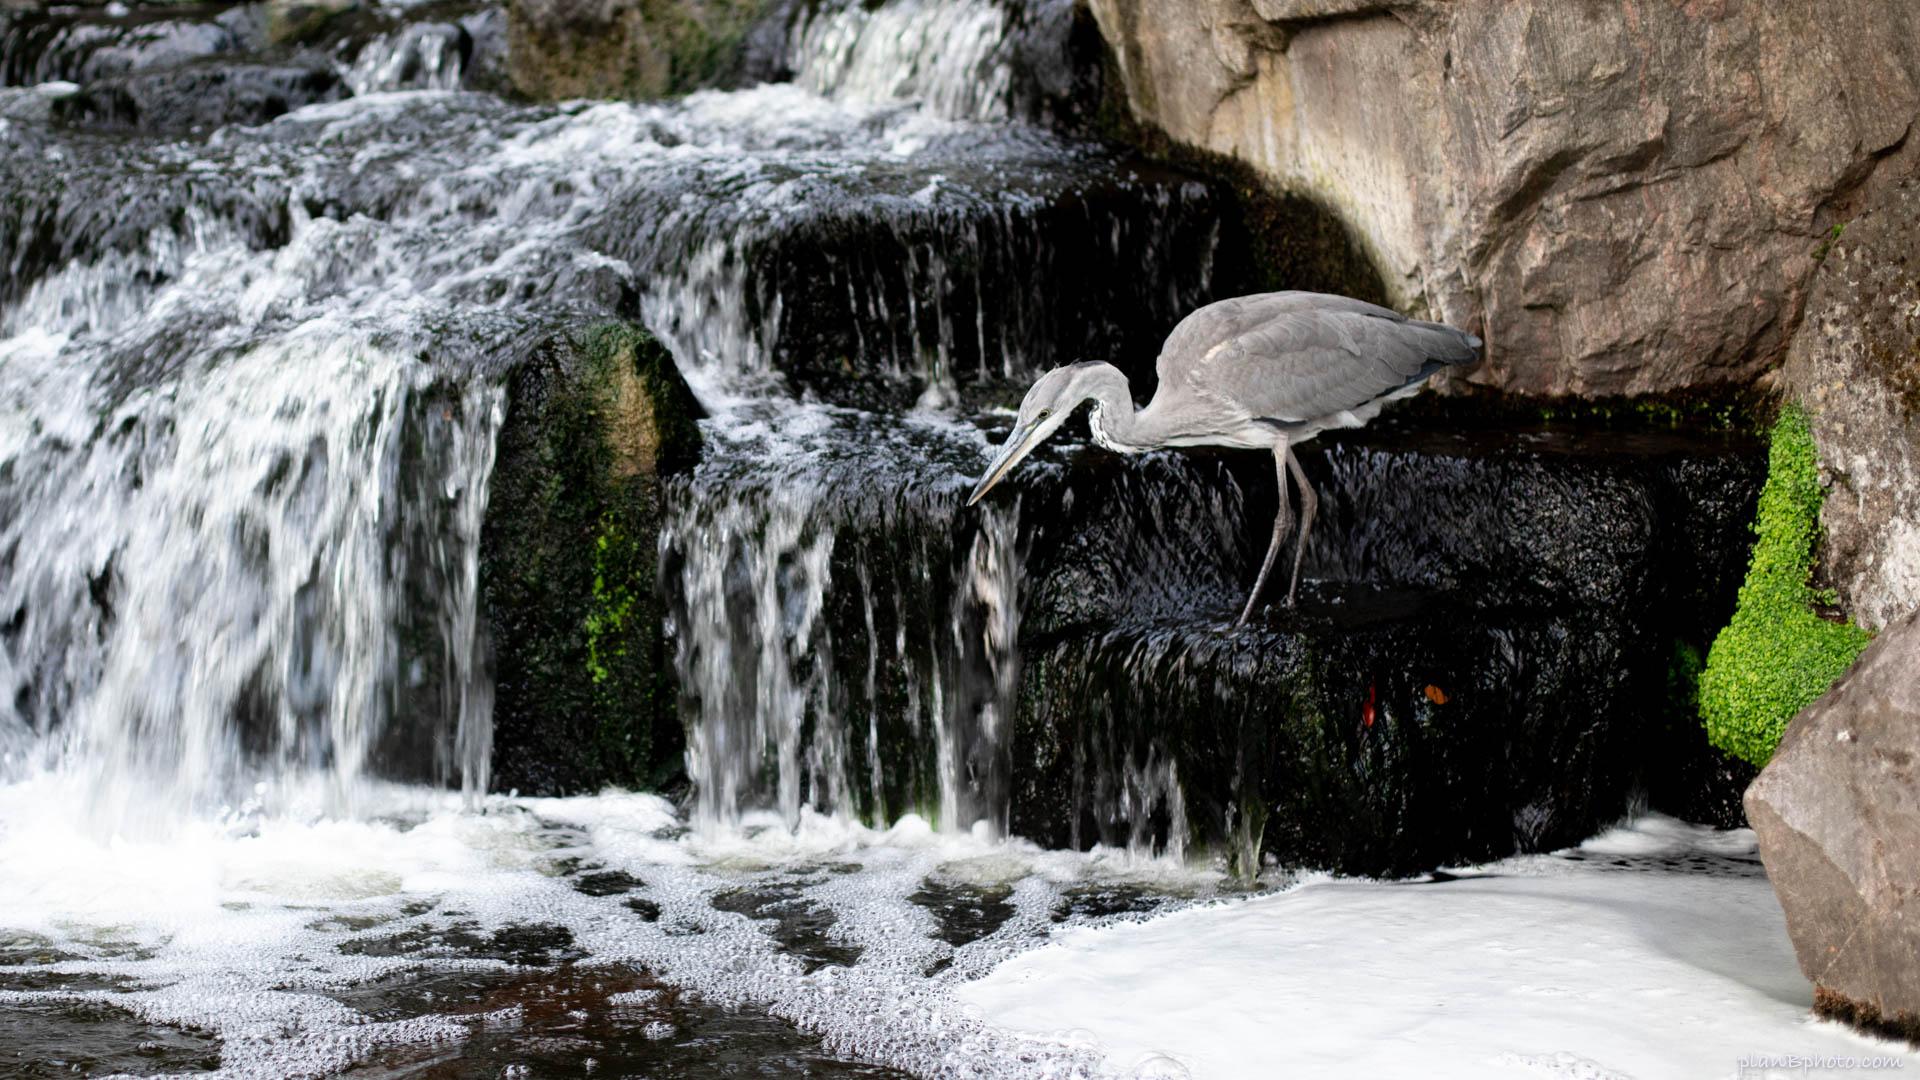 Heron bird near a small waterfall looking foe fish